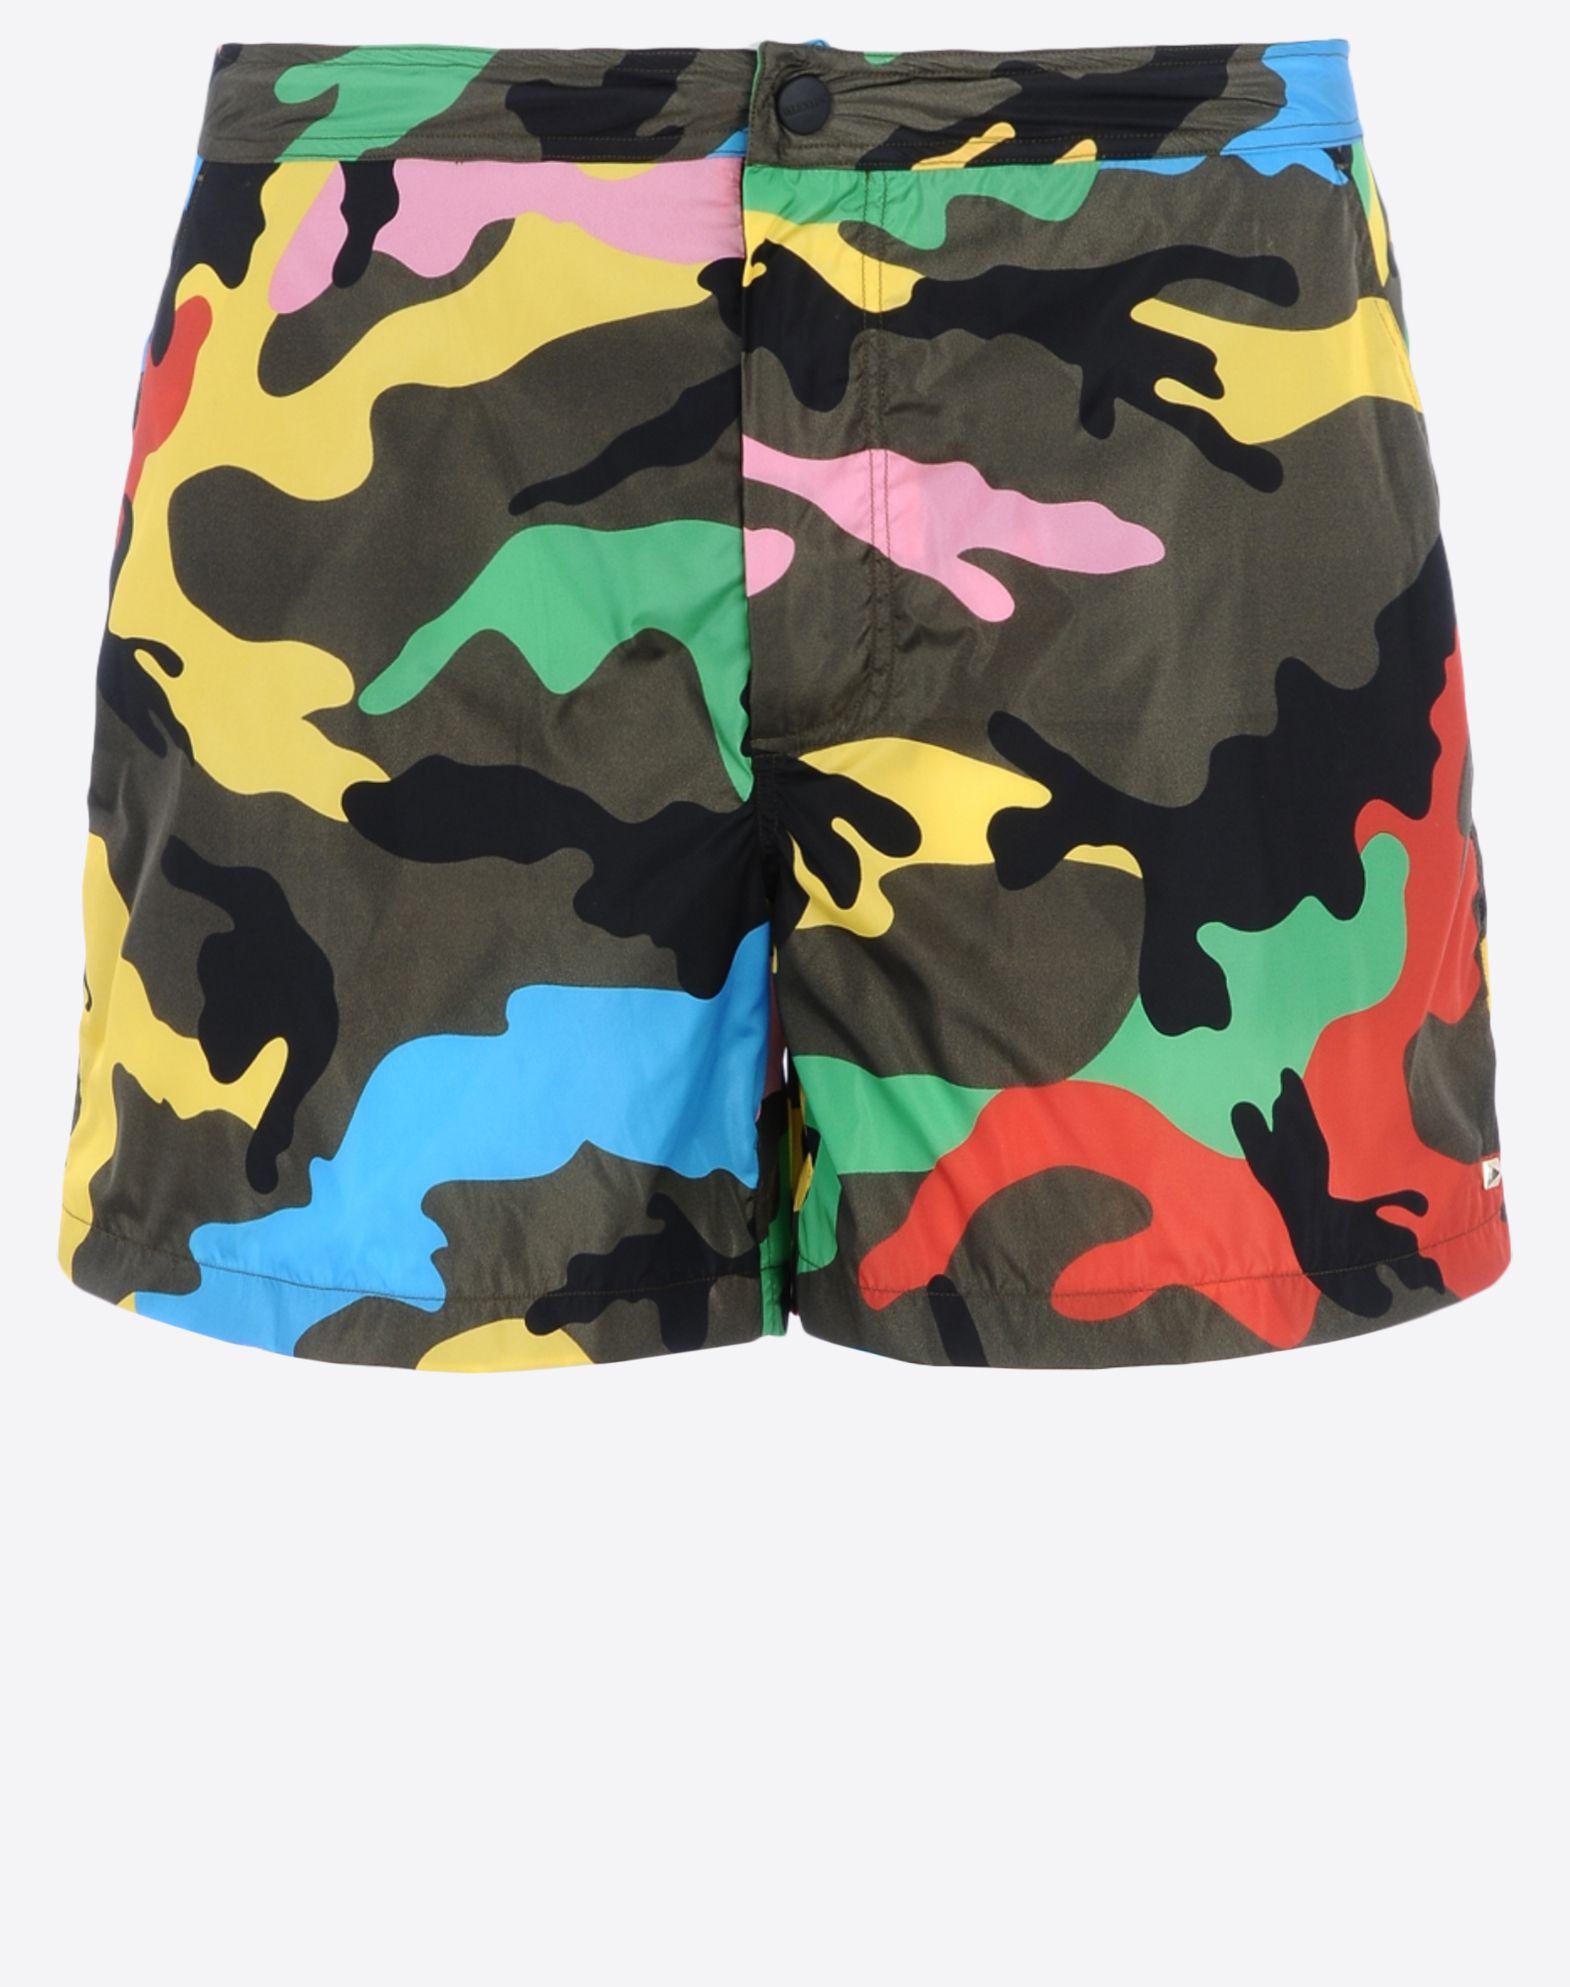 5140935372 valentino shorts mens, Men's Shorts | Women's Shorts | Latest Styles ...